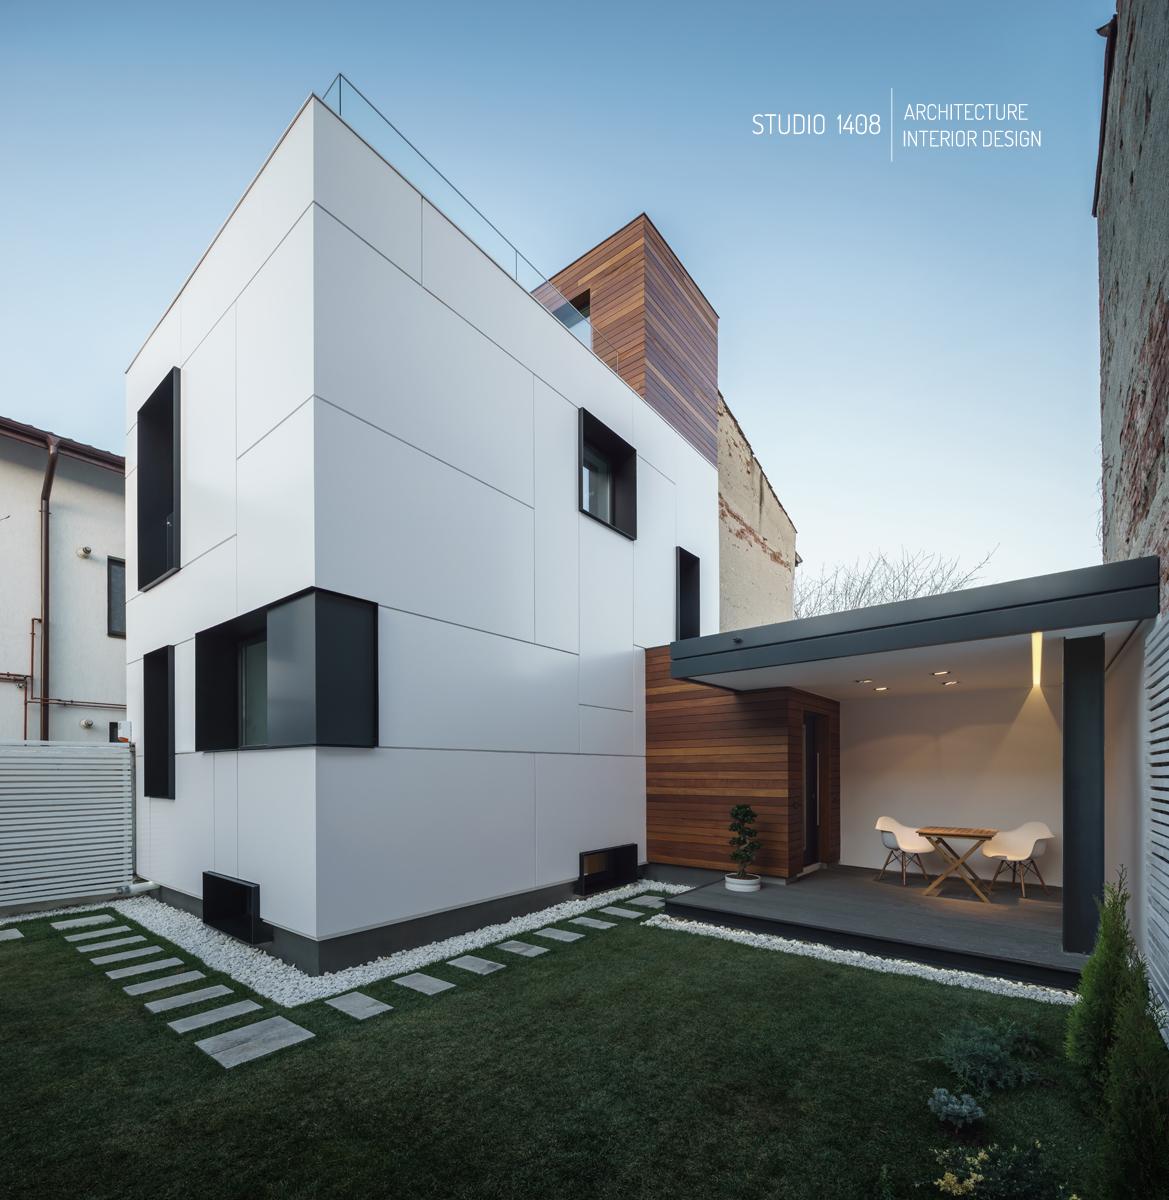 casa r conversie eleganta in detalii minimaliste arhipura